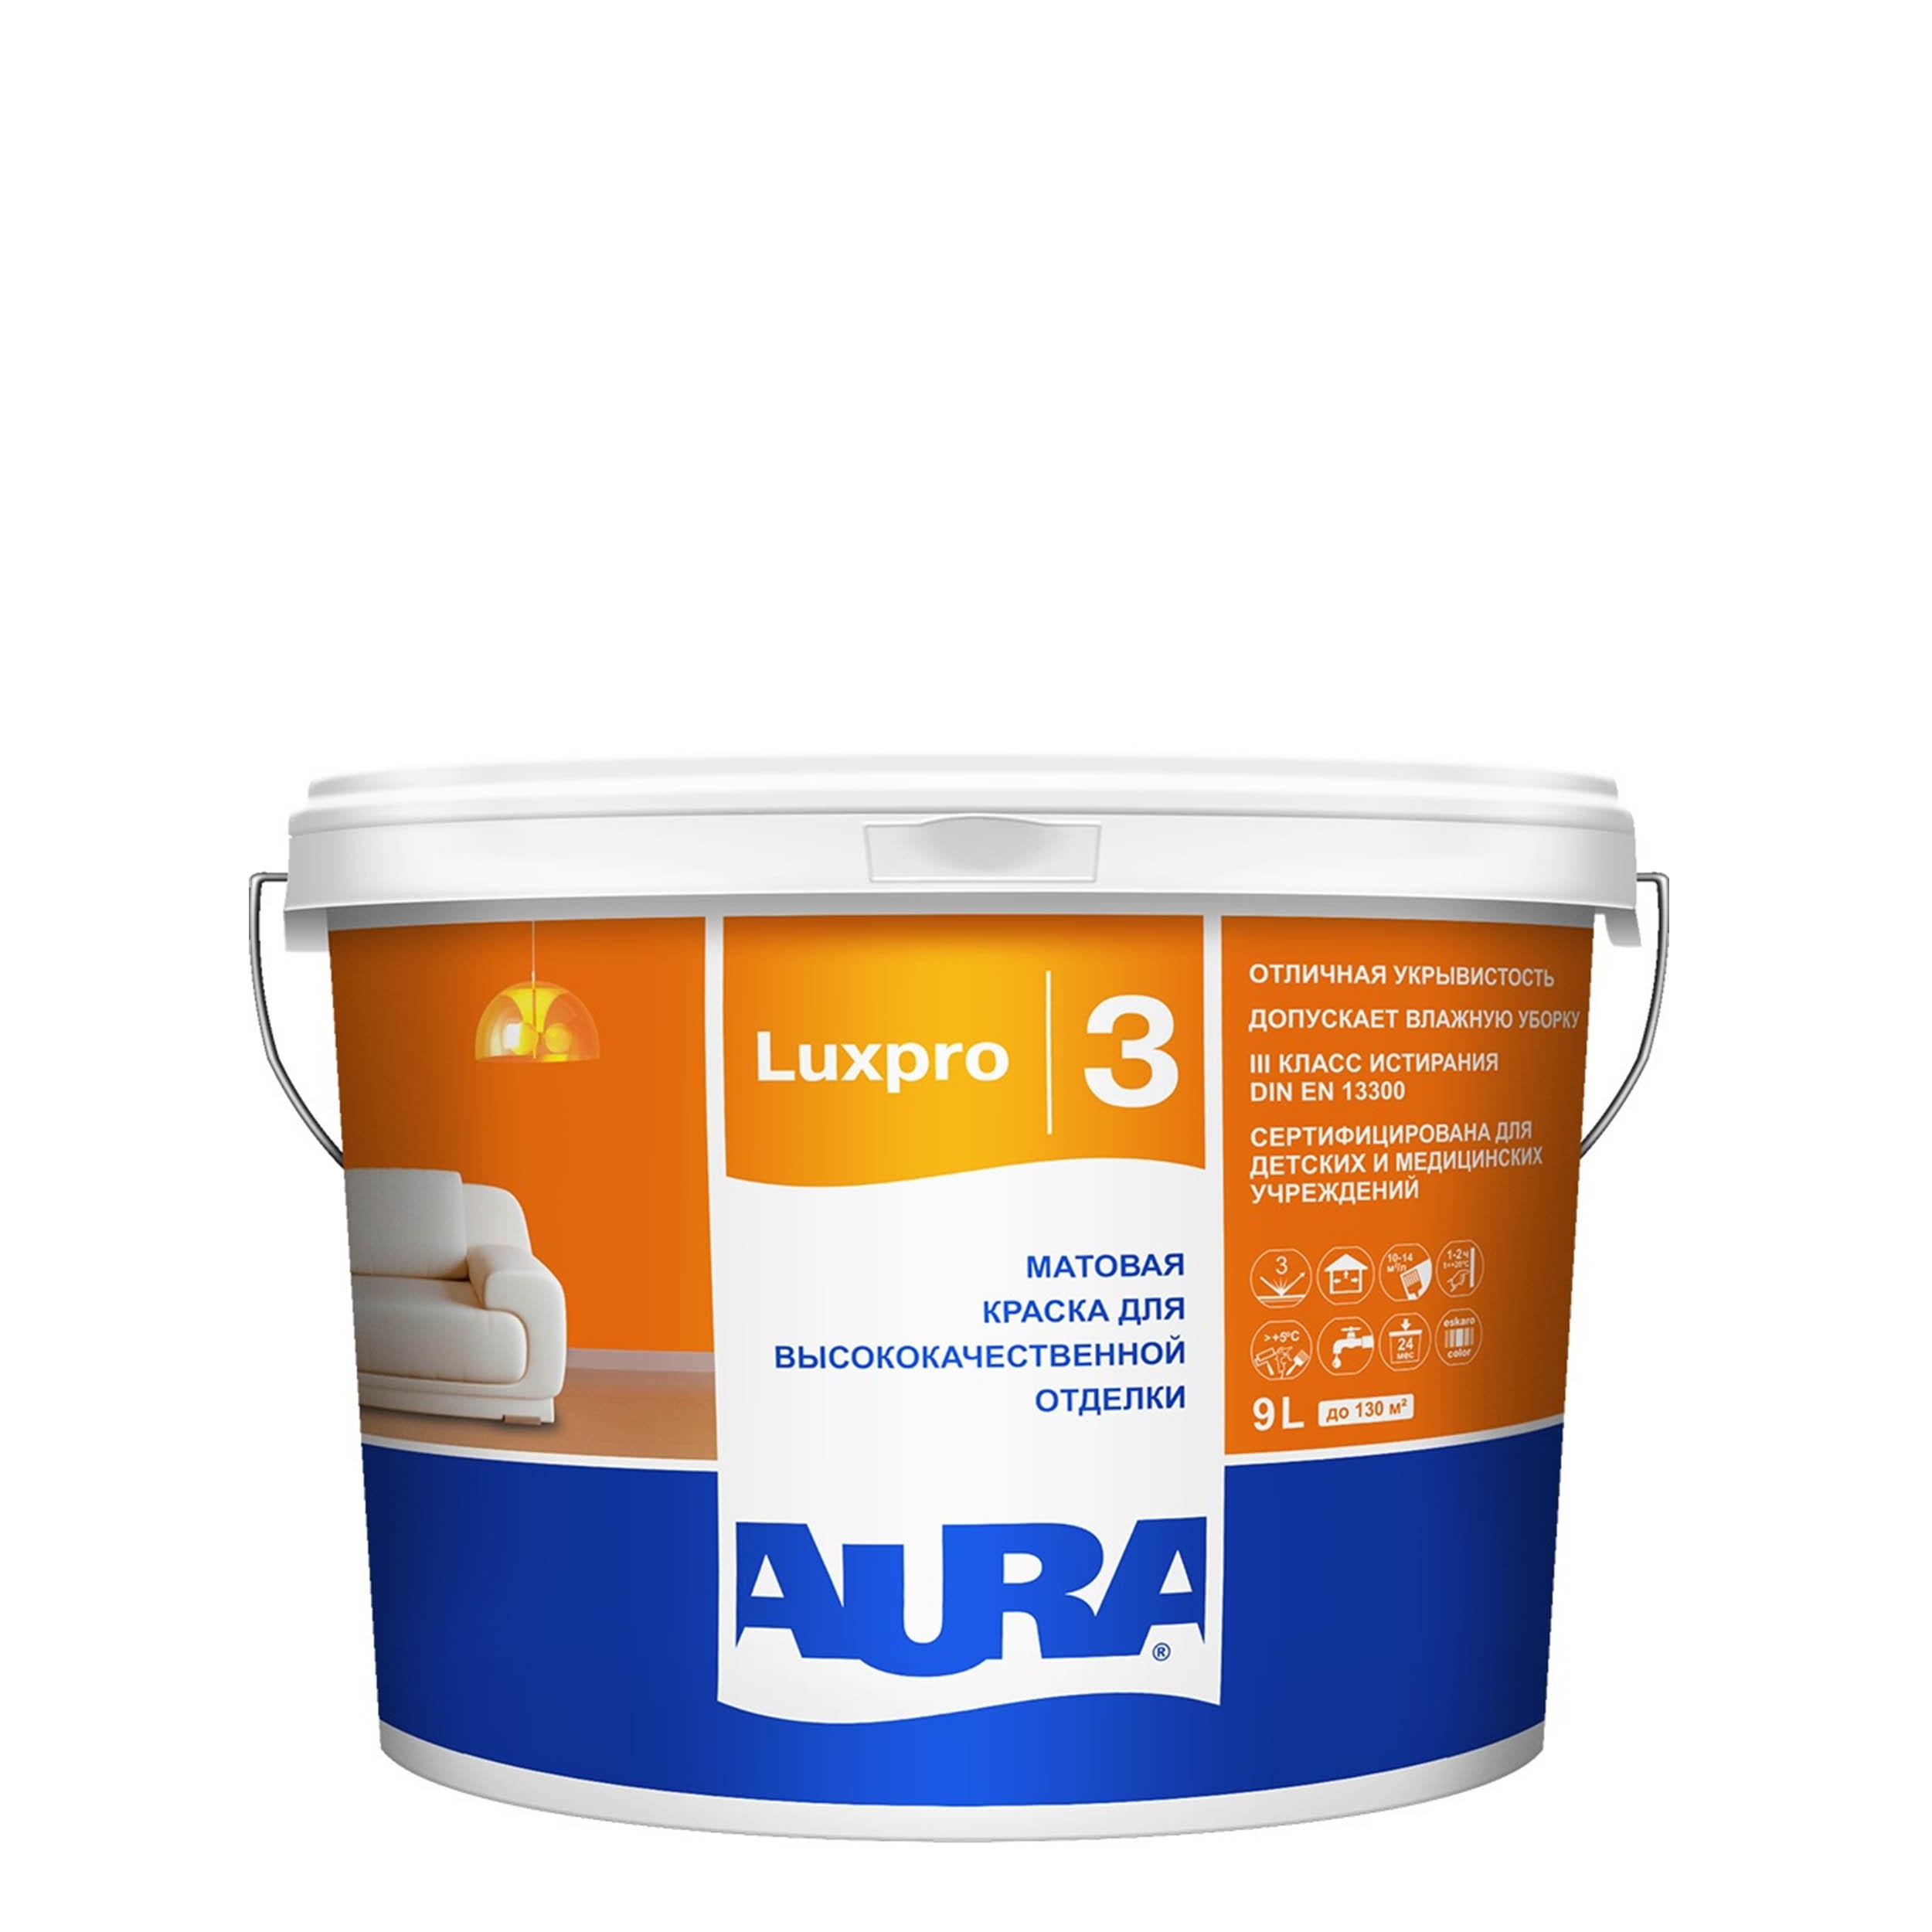 Фото 4 - Краска интерьерная, Aura LuxPRO 3, RAL 5021, 11 кг.